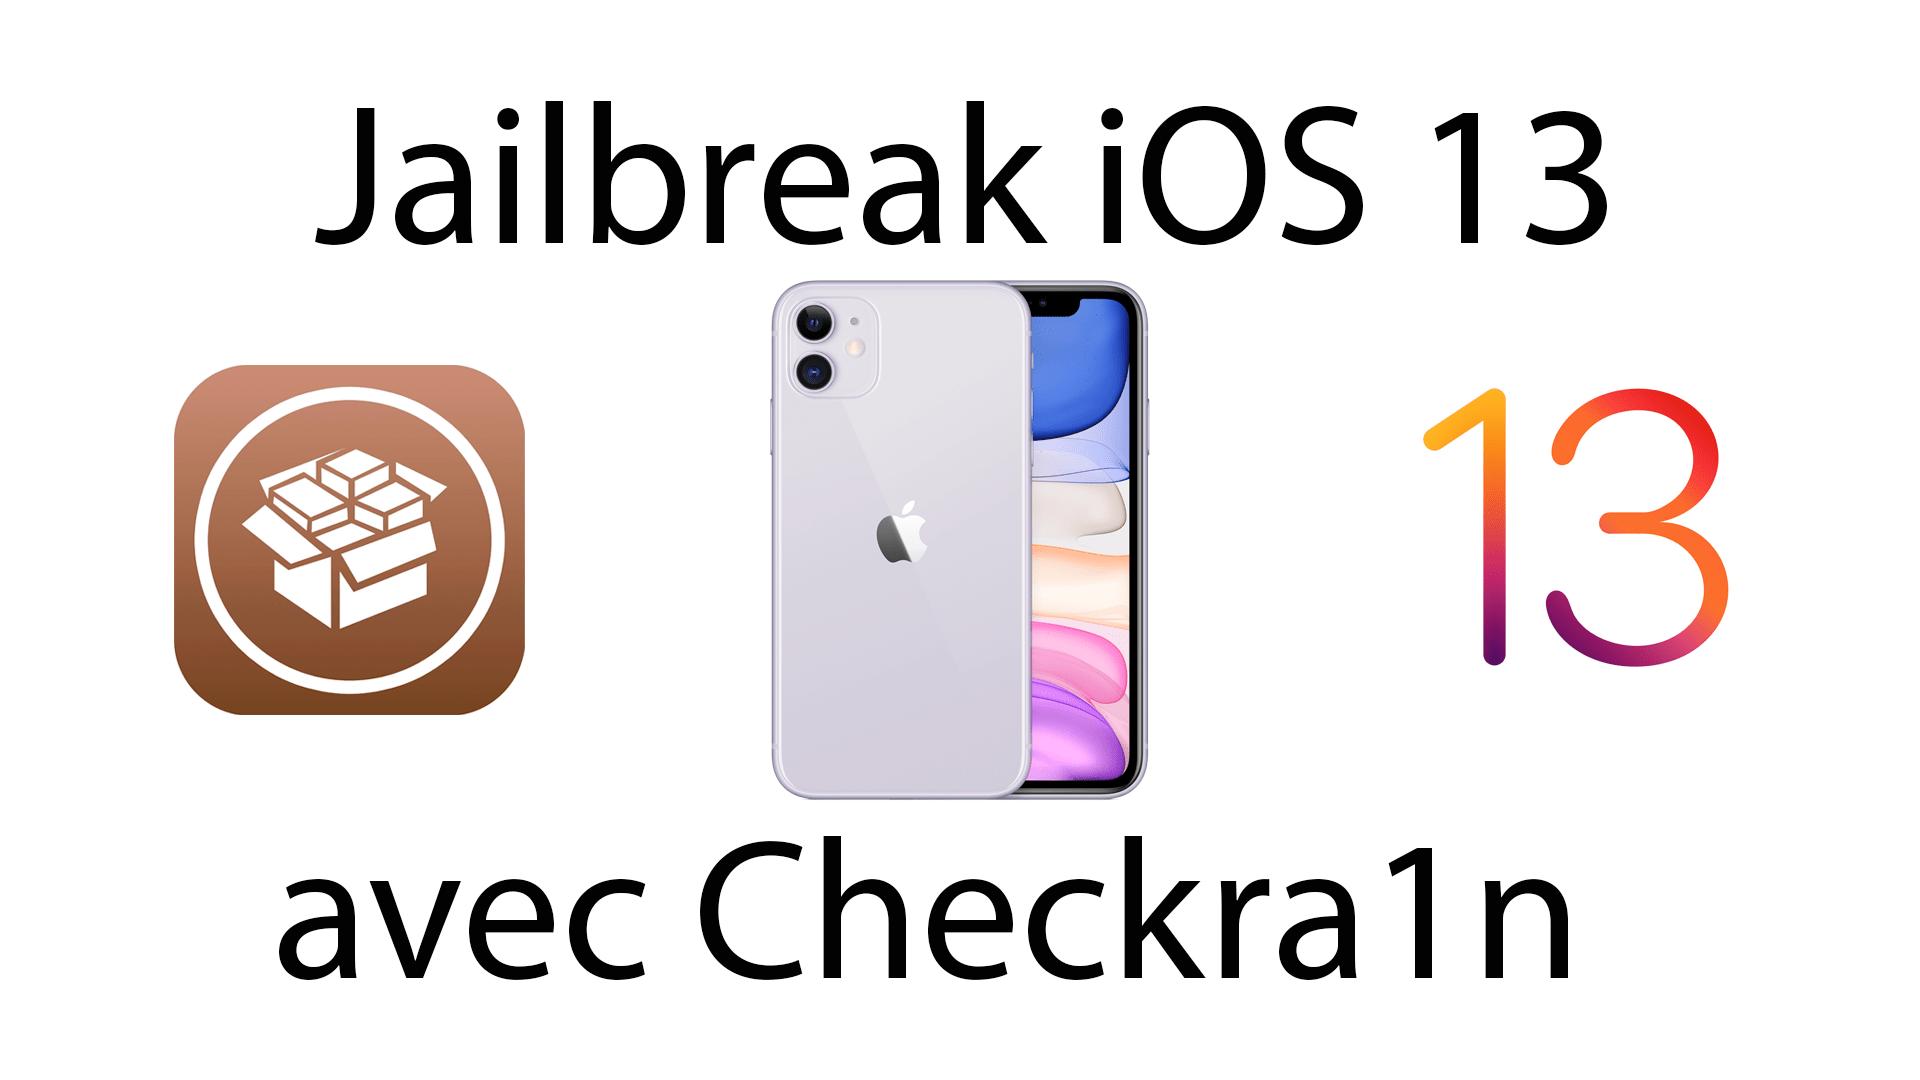 jailbreak checkra1n iOS 13